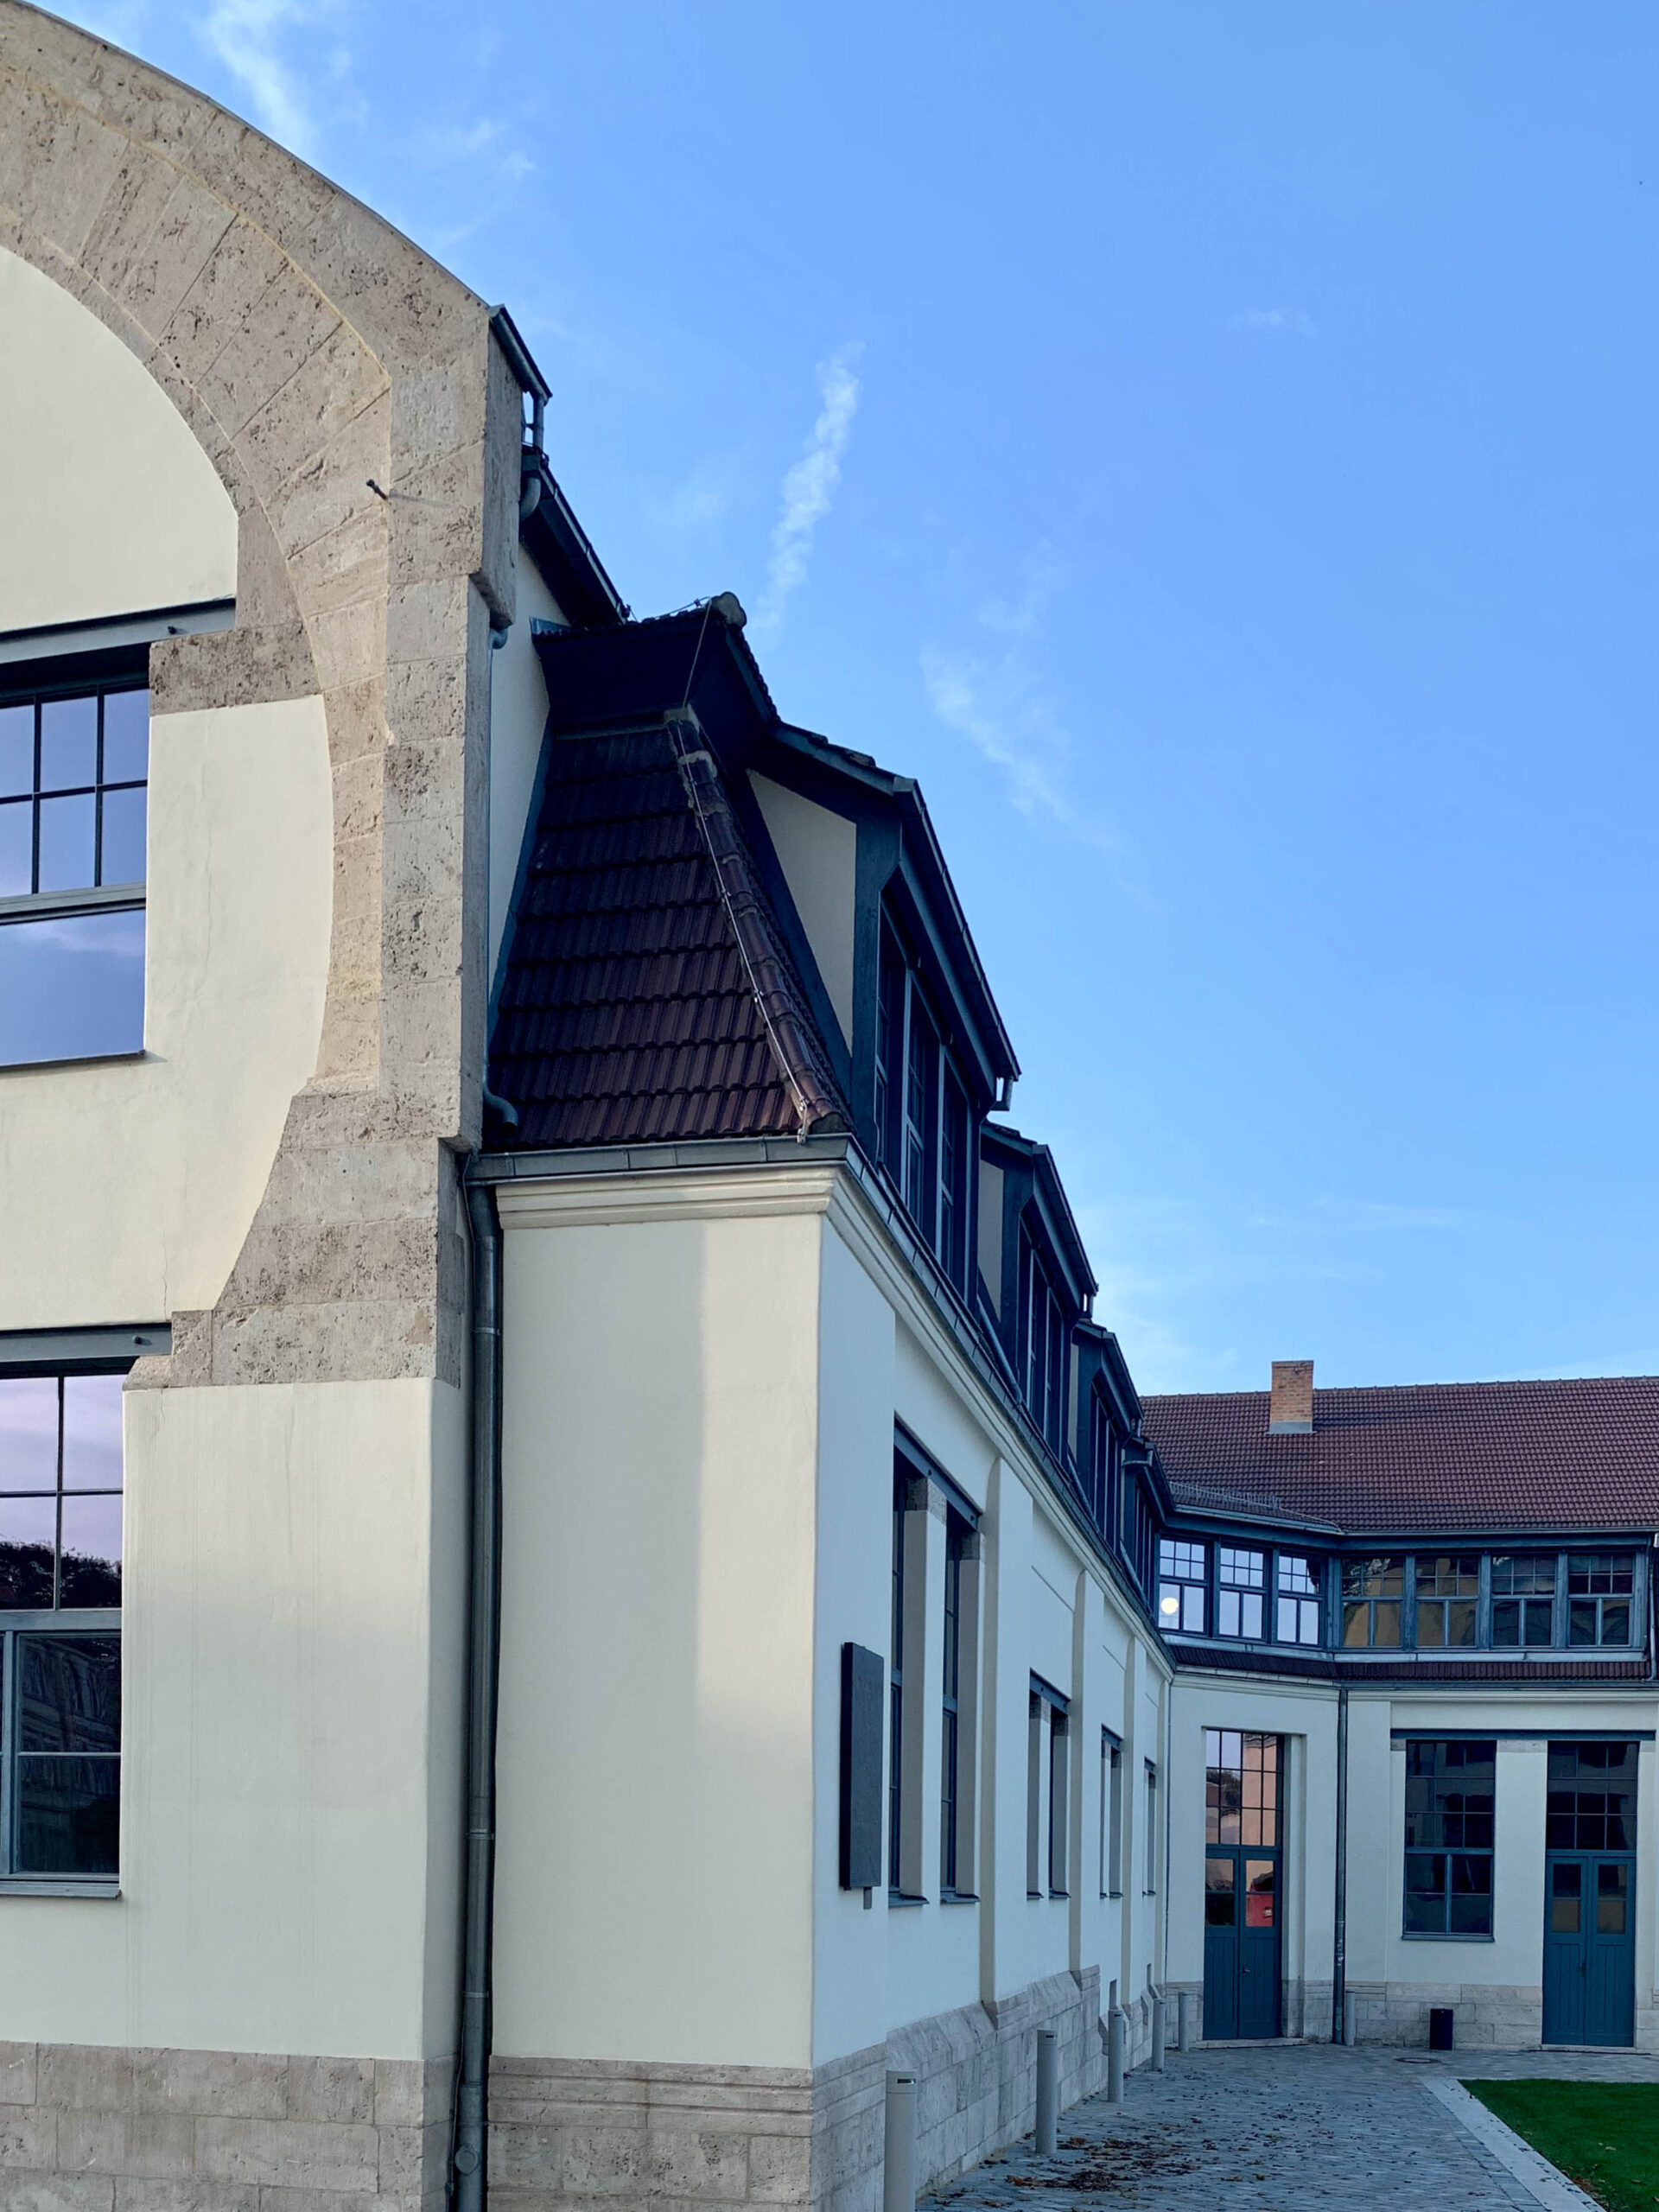 Grand-Ducal Saxon School of Arts and Crafts, 1905-1906. Architect: Henry van de Velde